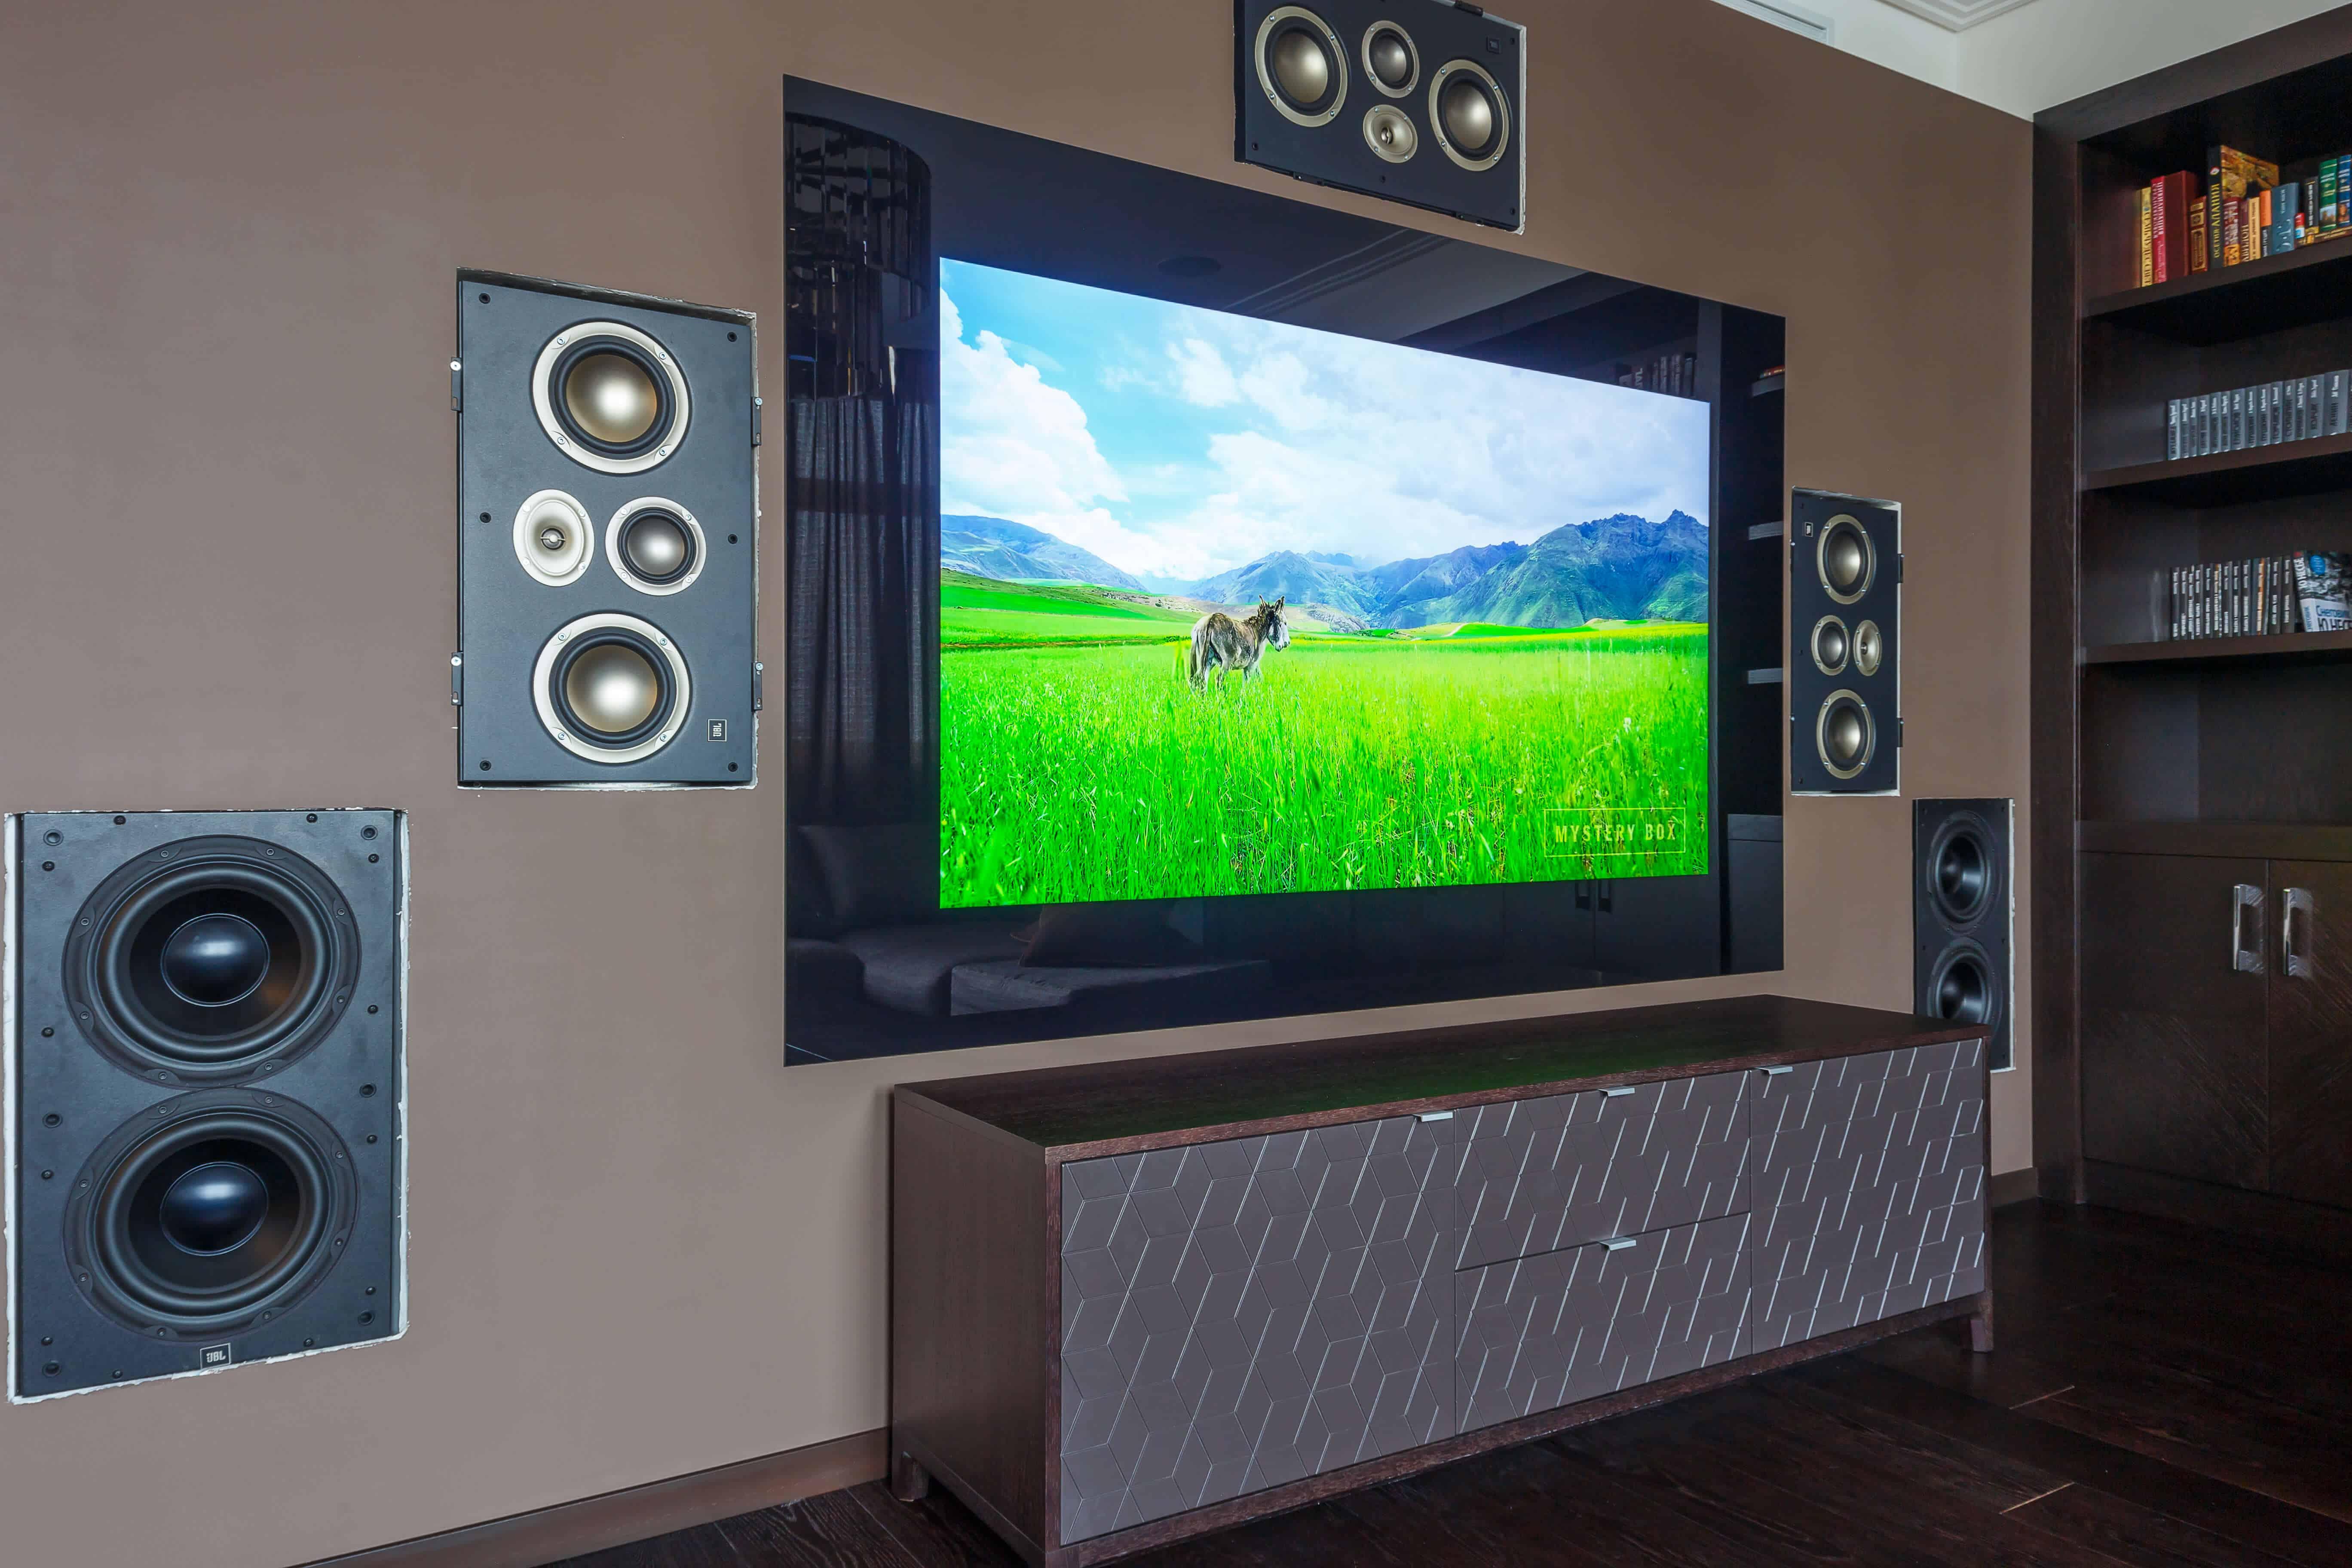 стеклянный телевизор